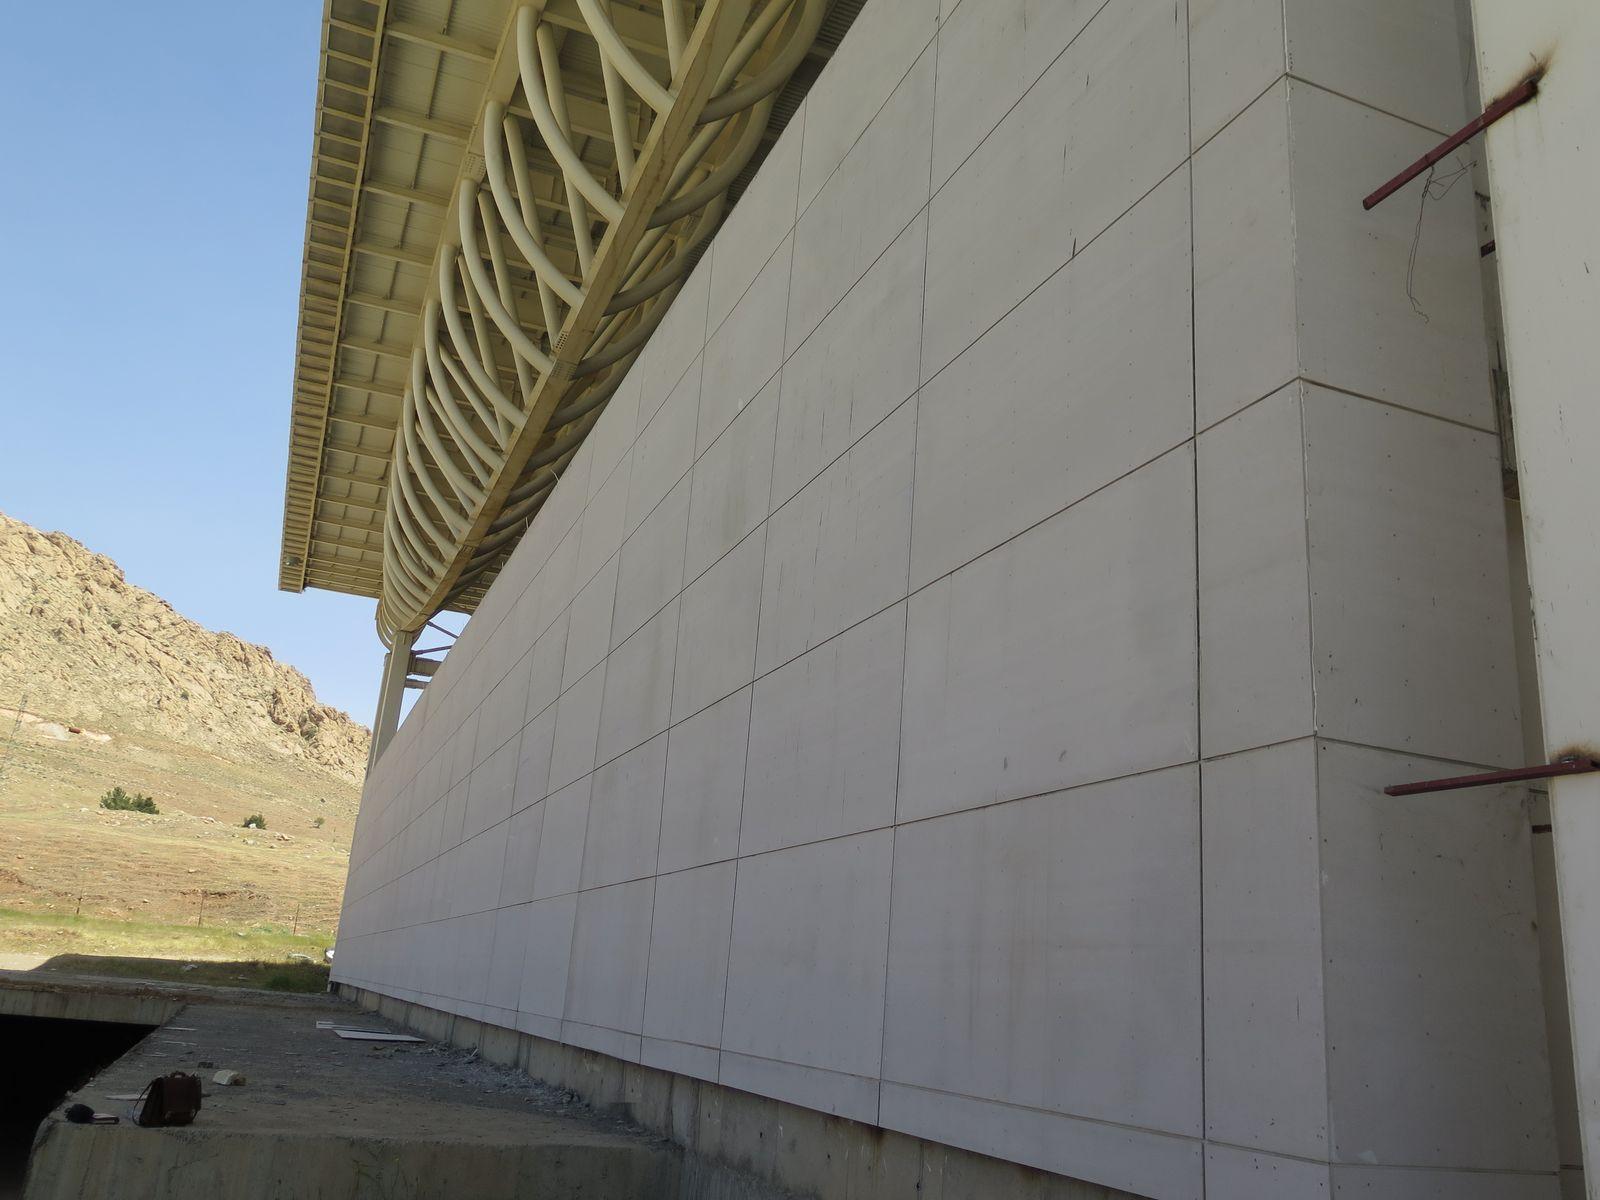 External Drywall SCG - Drywall Construction